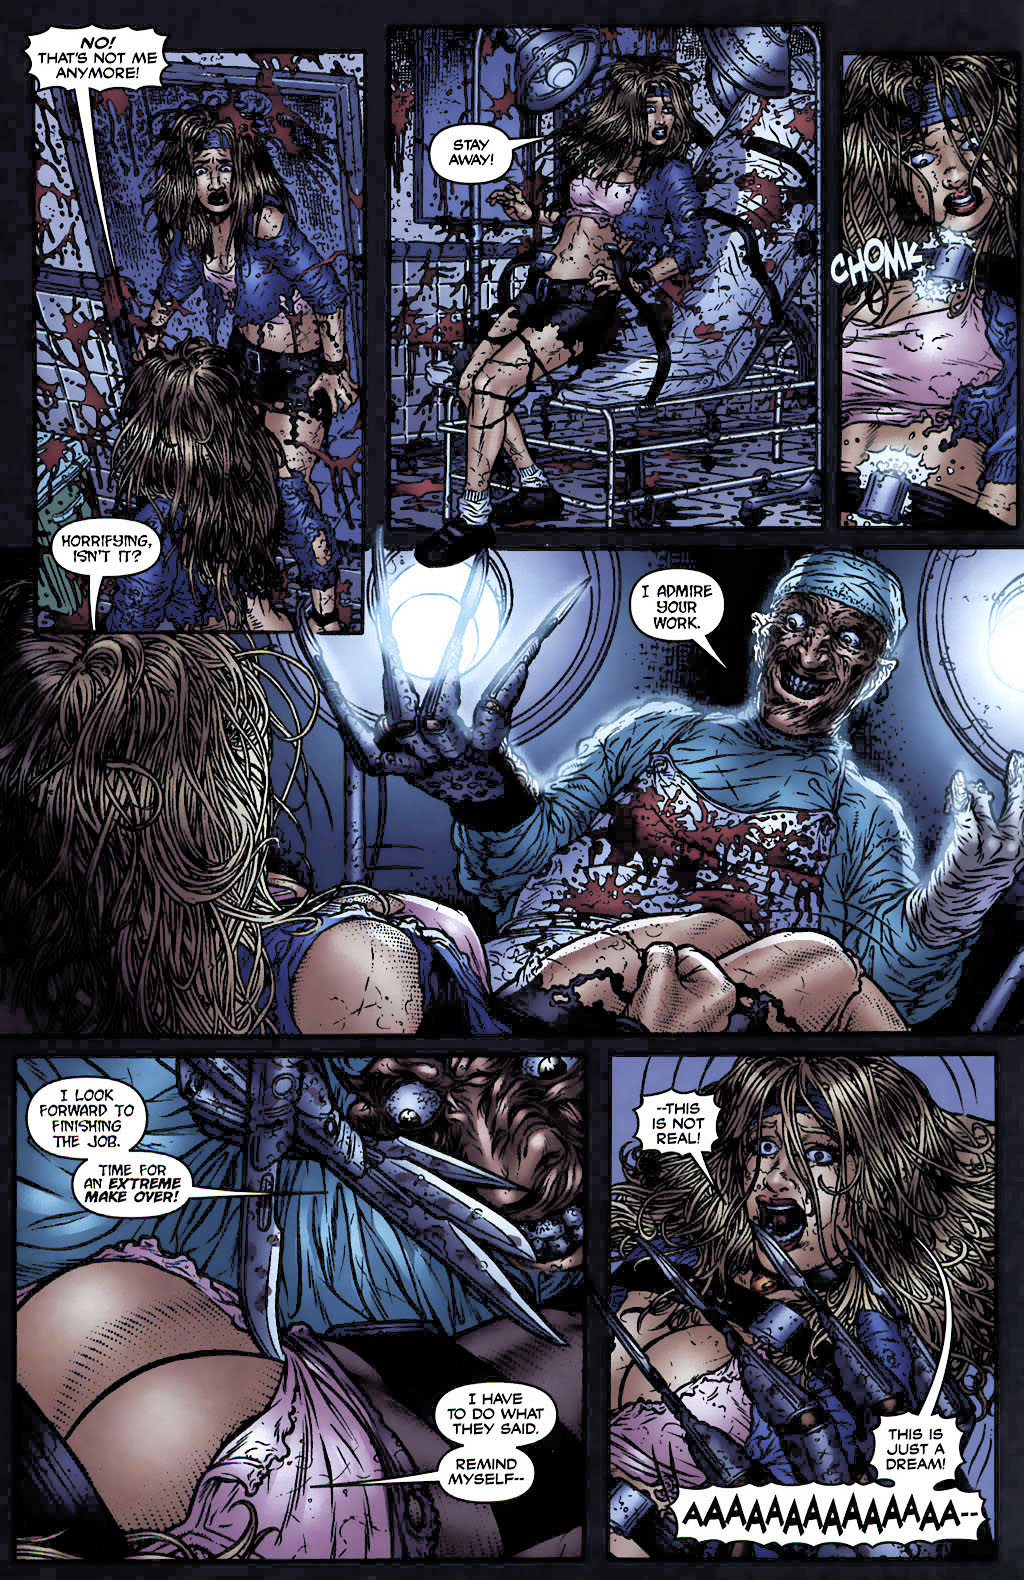 Avatar Porno Pelicula 2005-2006] freddy krueger – avatar press – comicsvortex